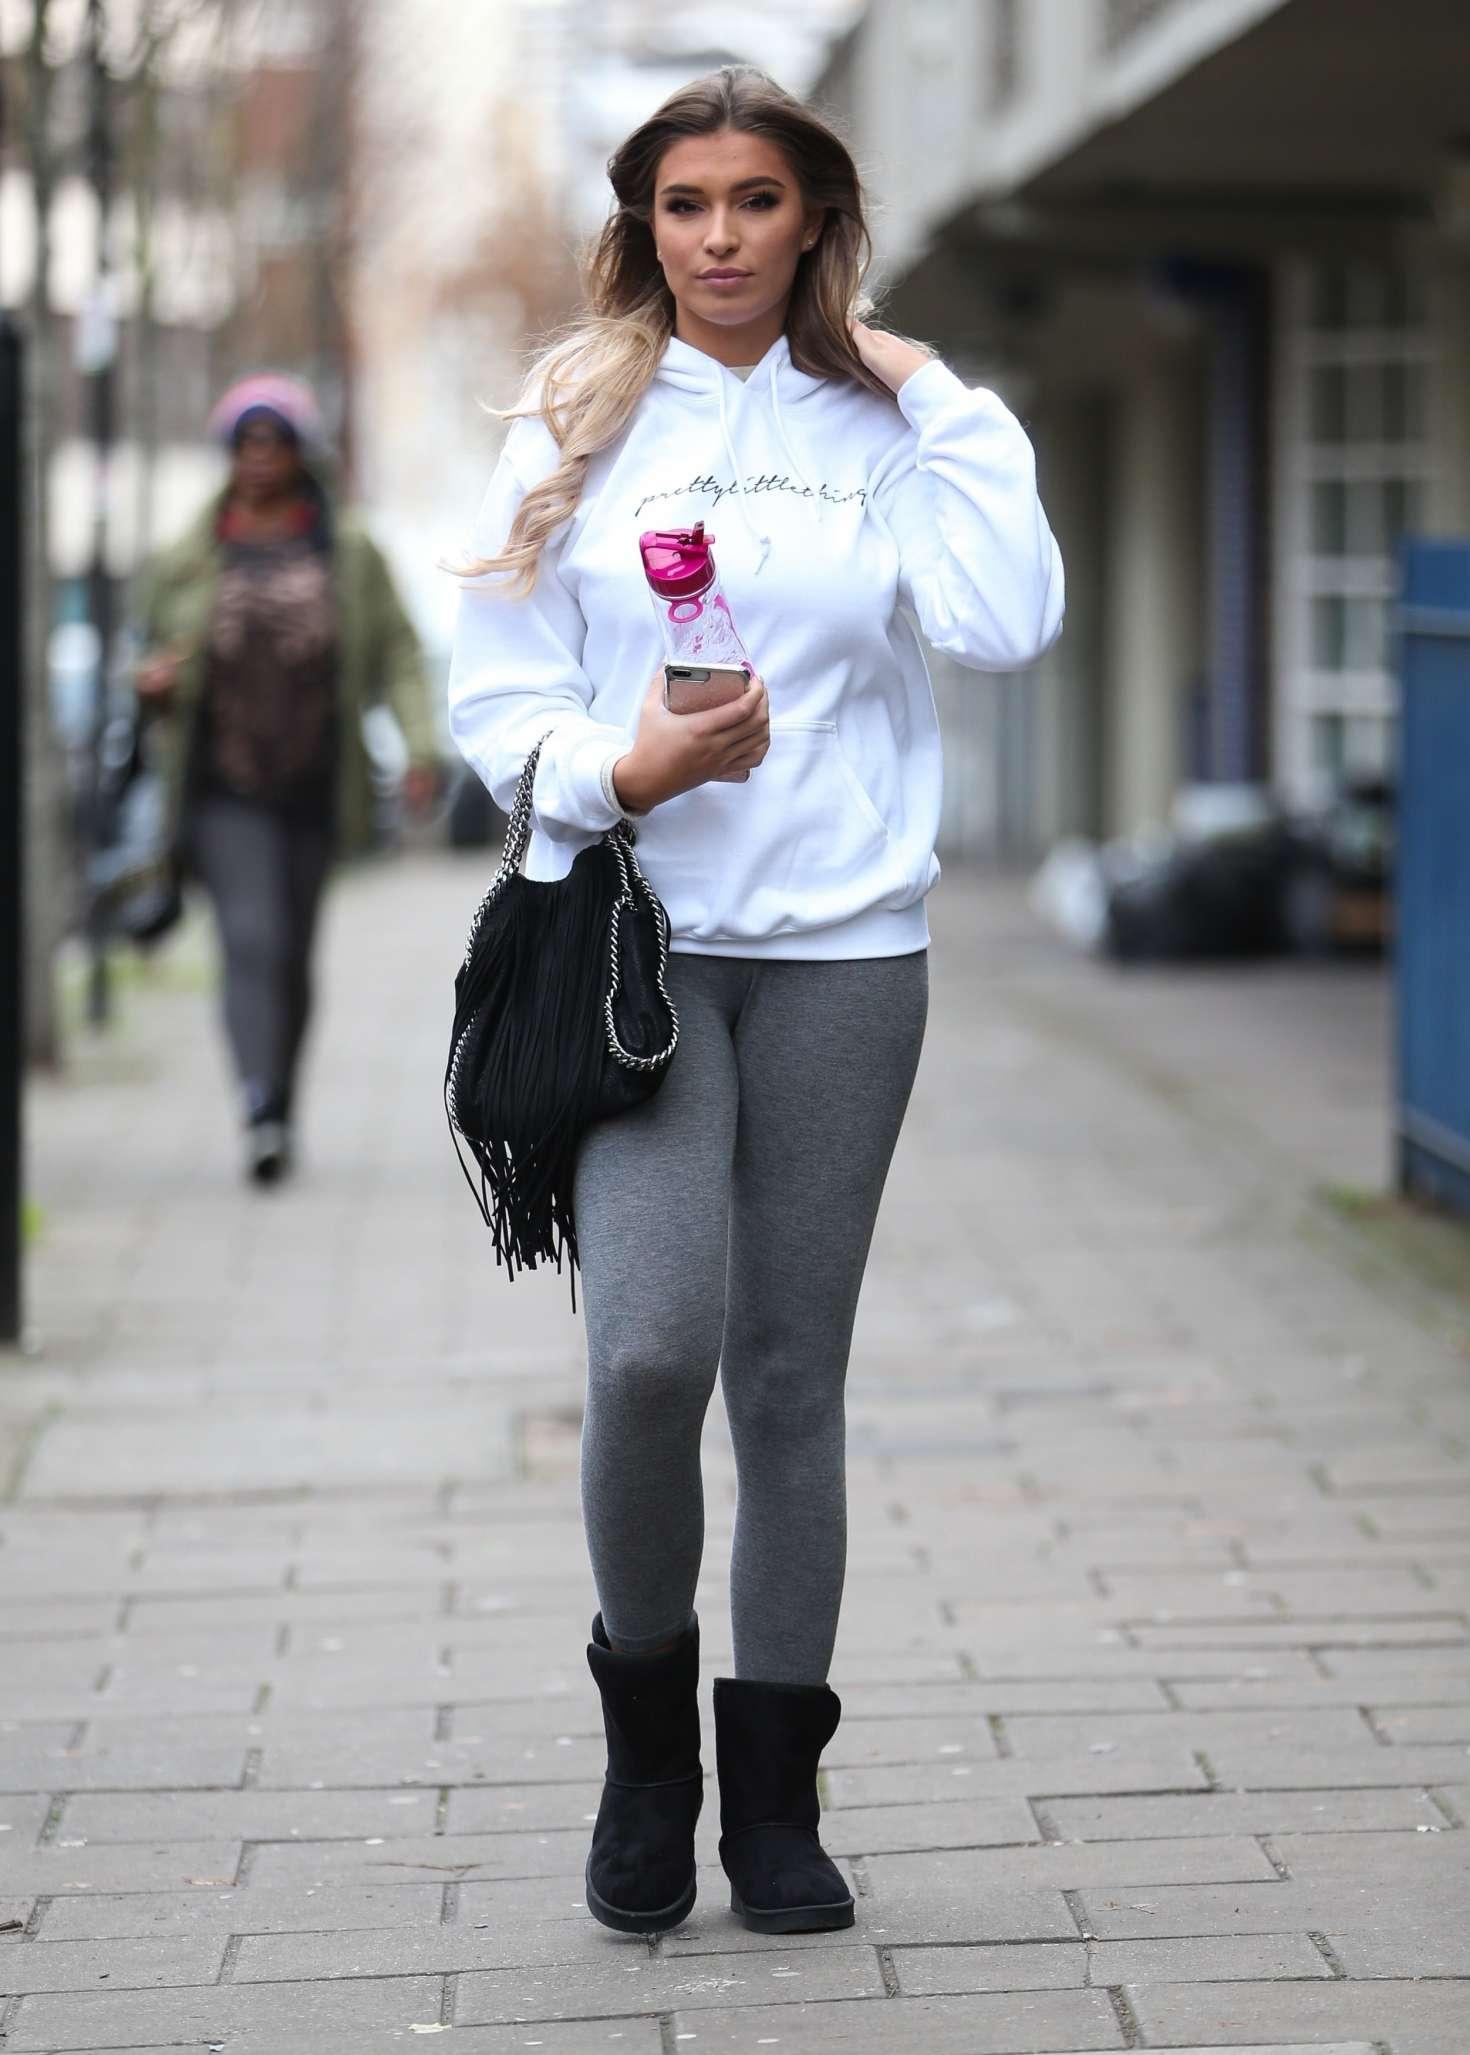 Zara McDermott 2018 : Zara McDermott: Arrives at photoshoot -04